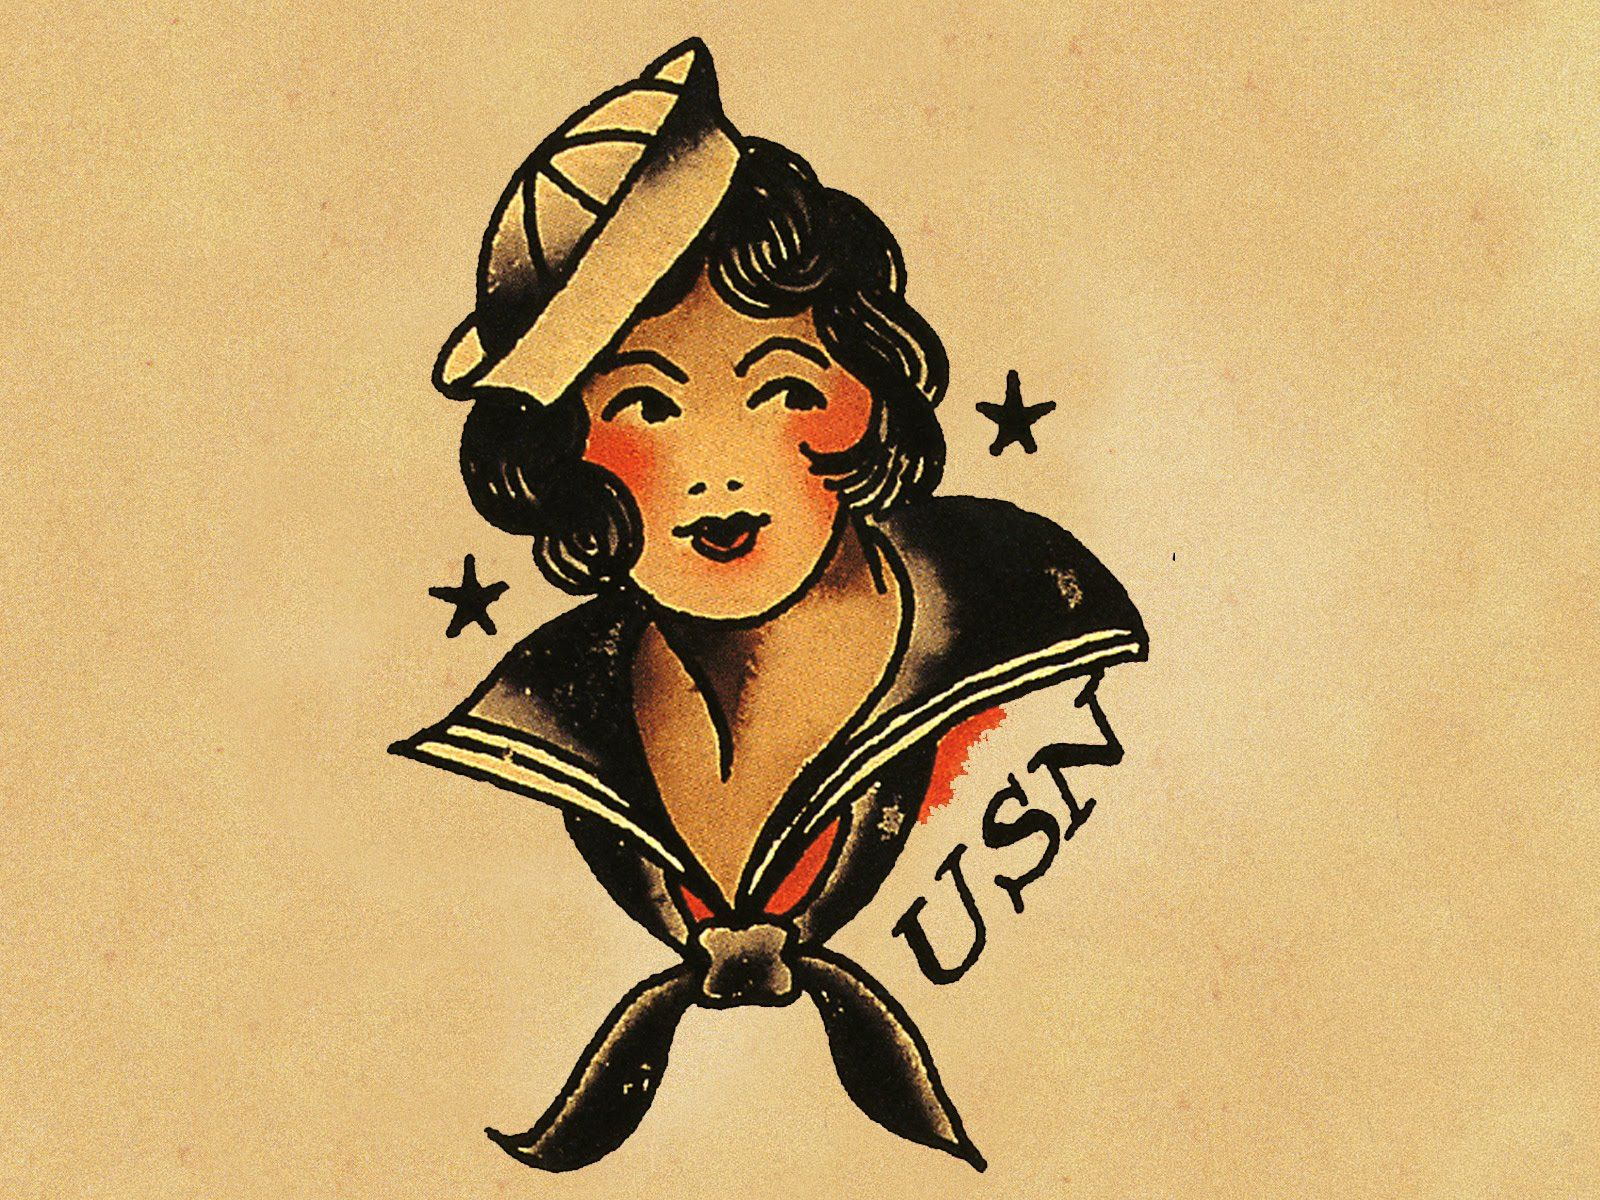 25 Sailor Jerry Tattoos to Rock Your World | Sailor jerry, Tattoo ...